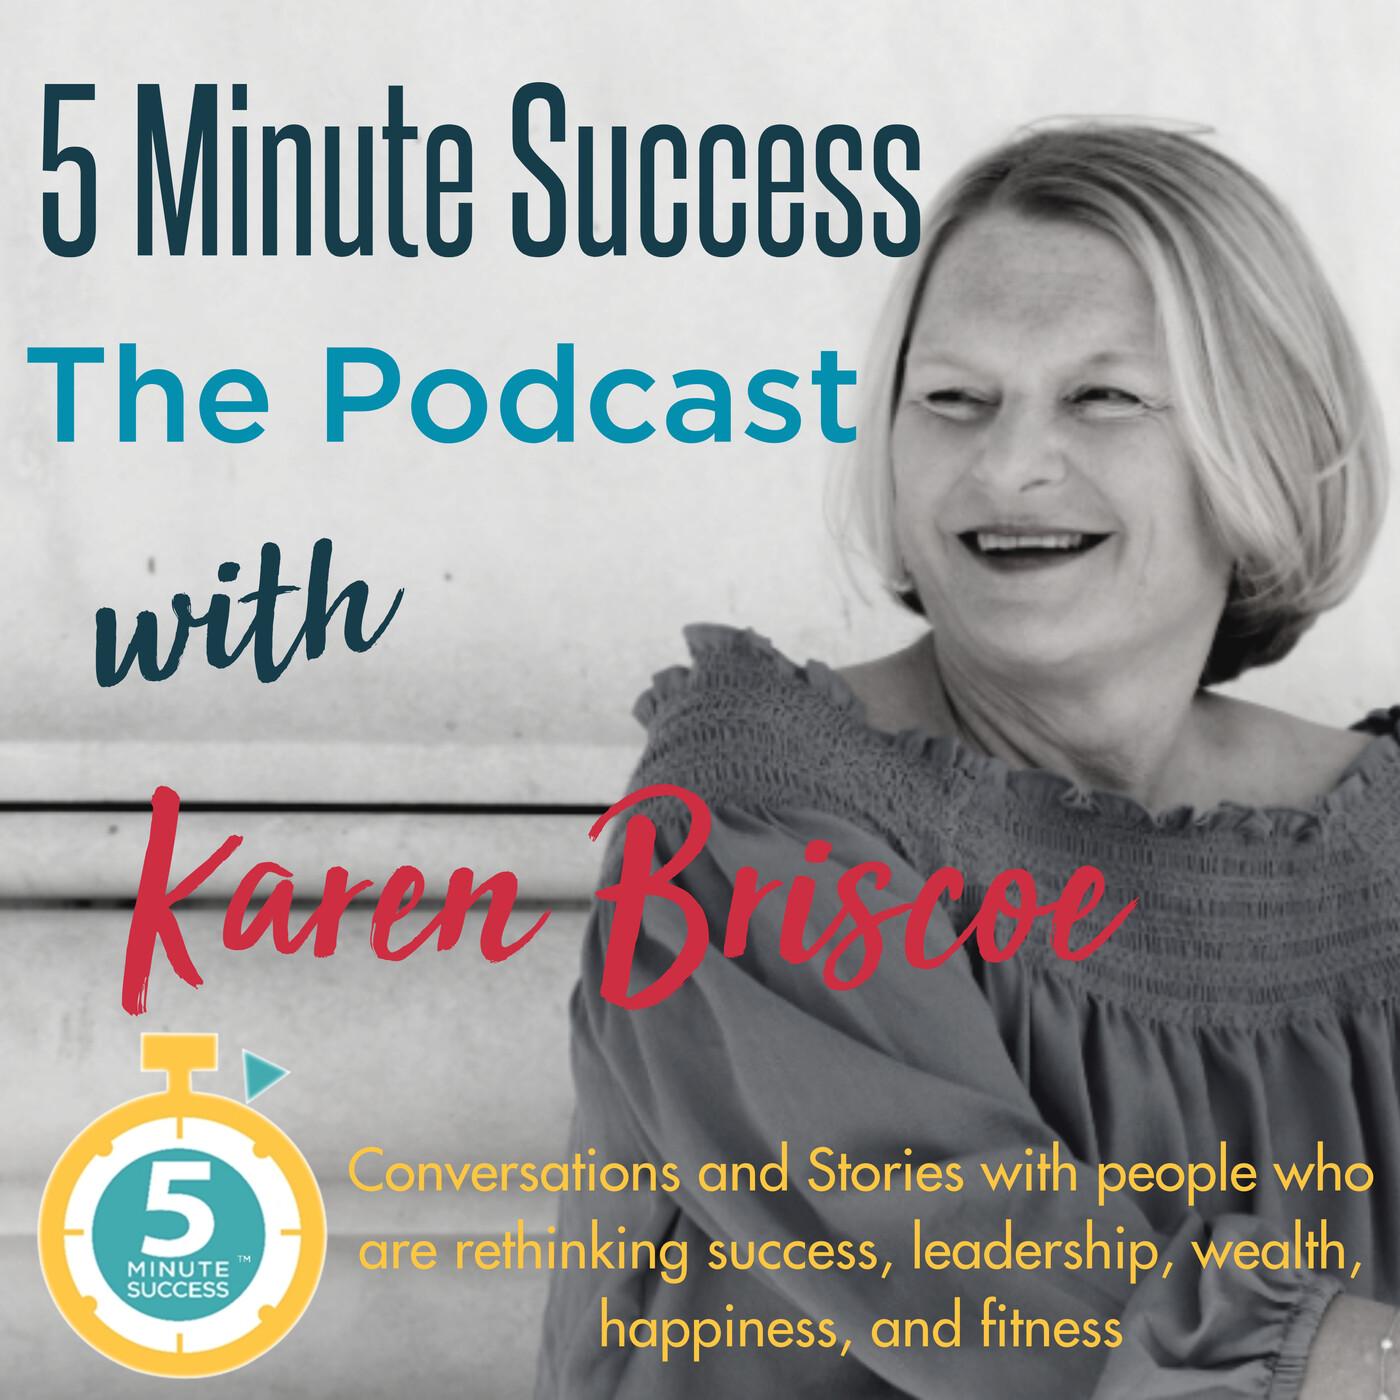 Dan Rochon - Secrets of Consistent & Predictable Income Revealed: 5 Minute Success - The Podcast